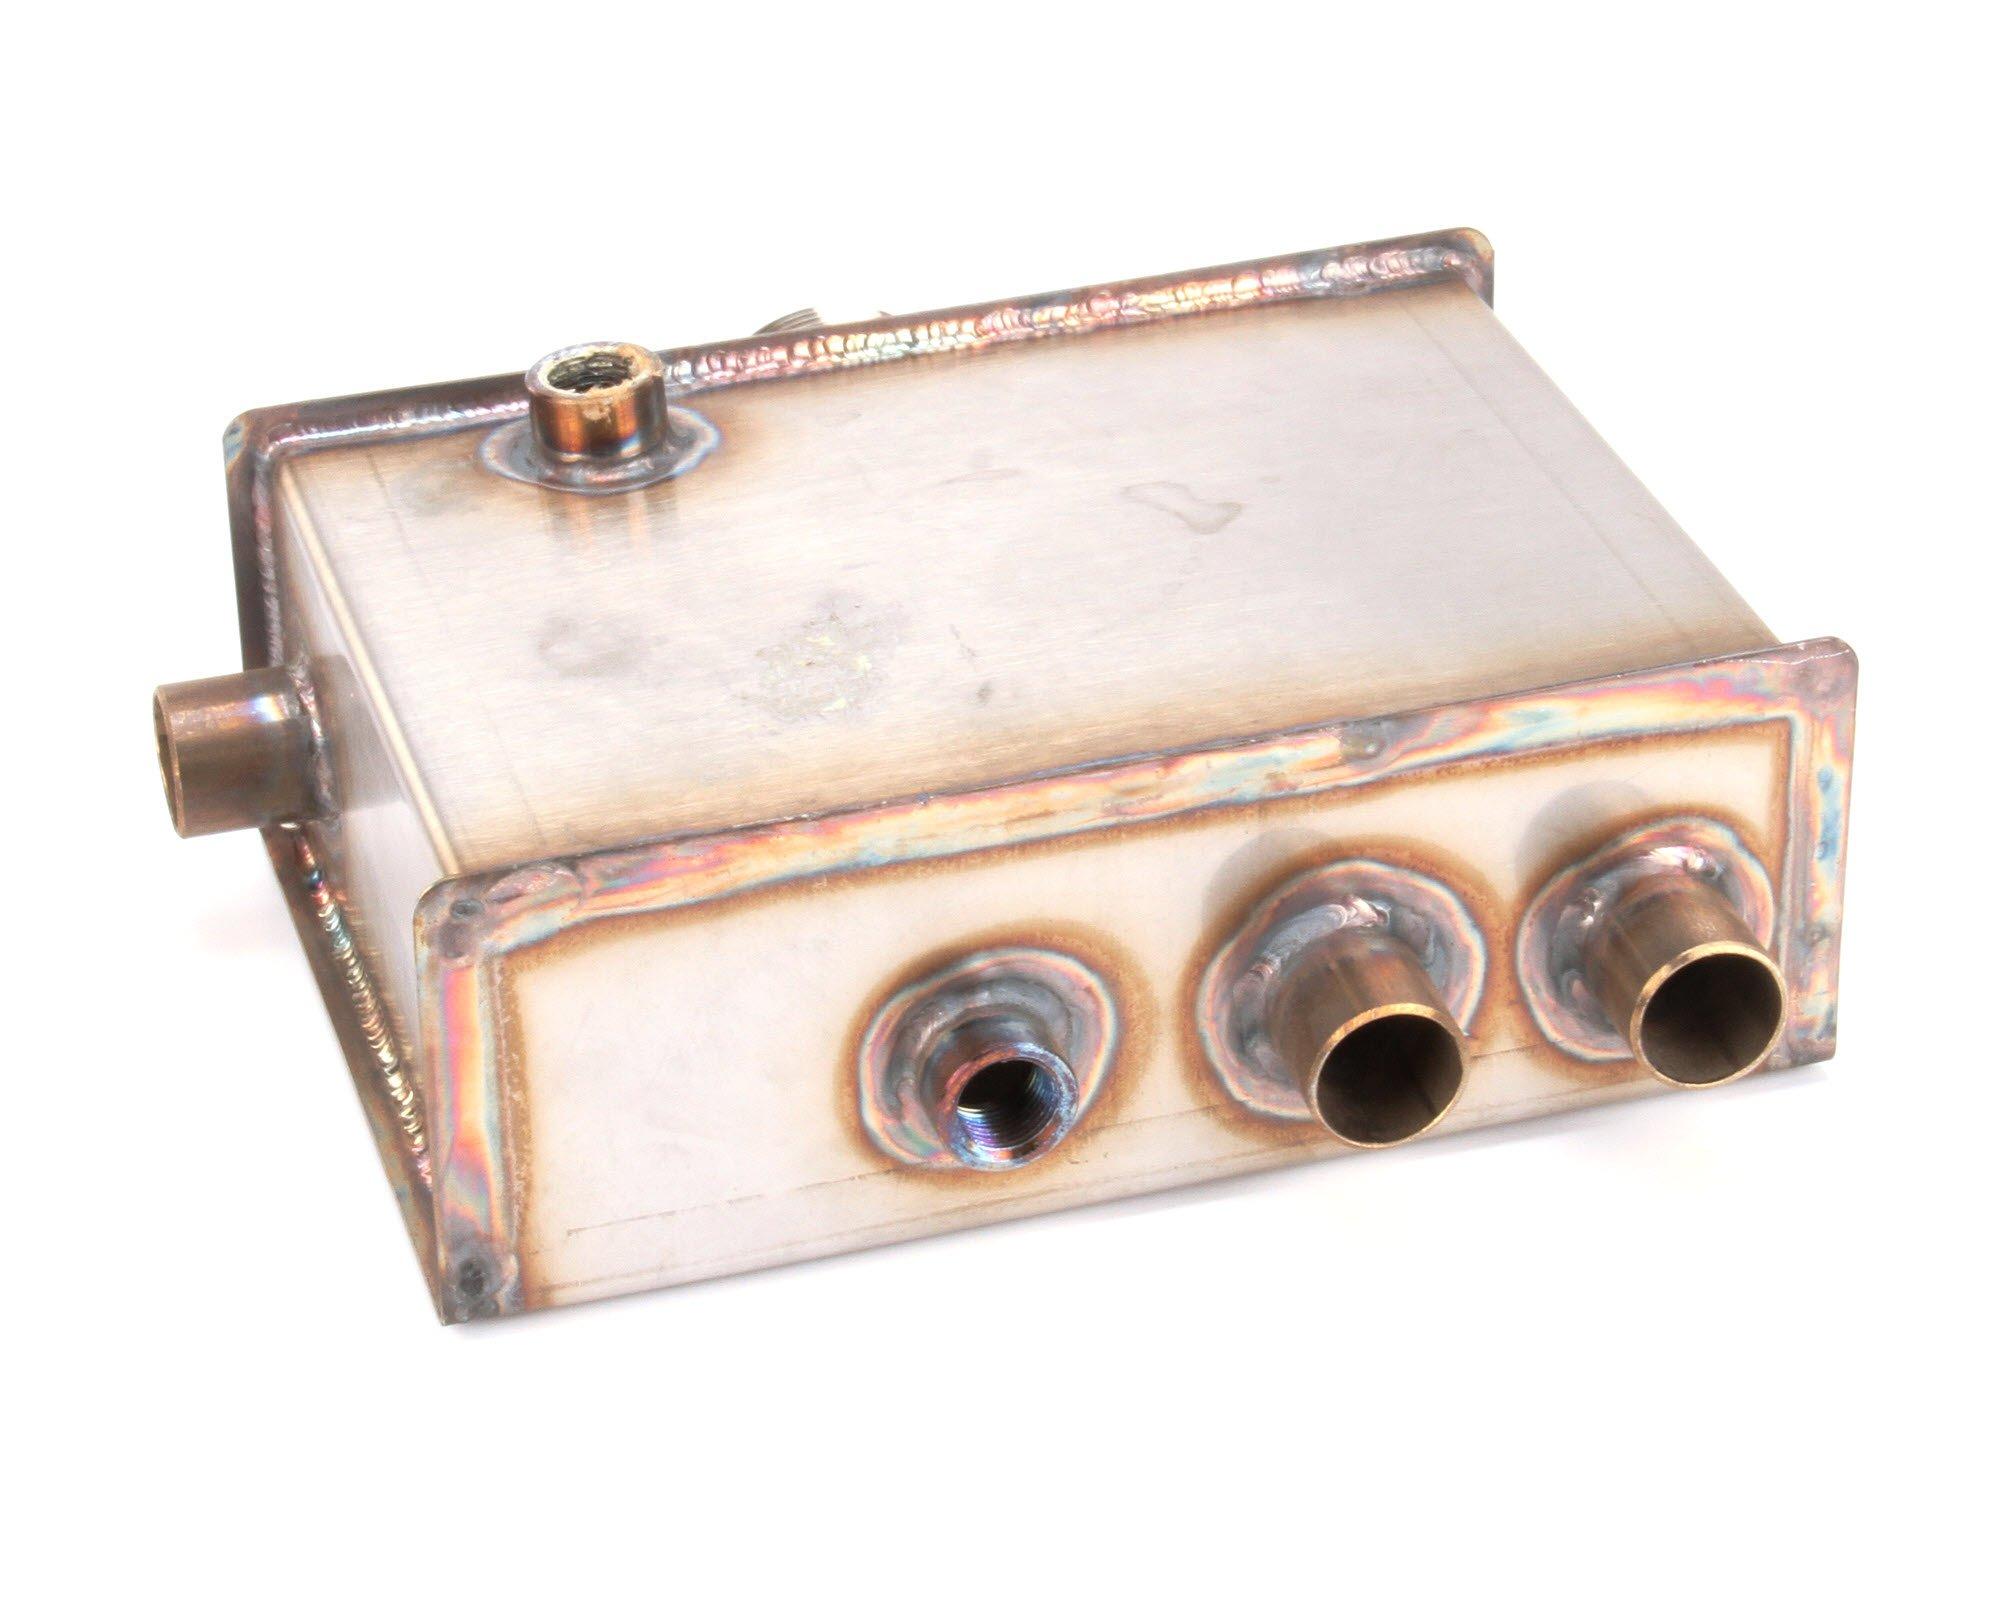 Vulcan-Hart 00-857068-00001 Condenser Box for Vulcan-Hart C24EA10 and C24EA6 Electric Steamers